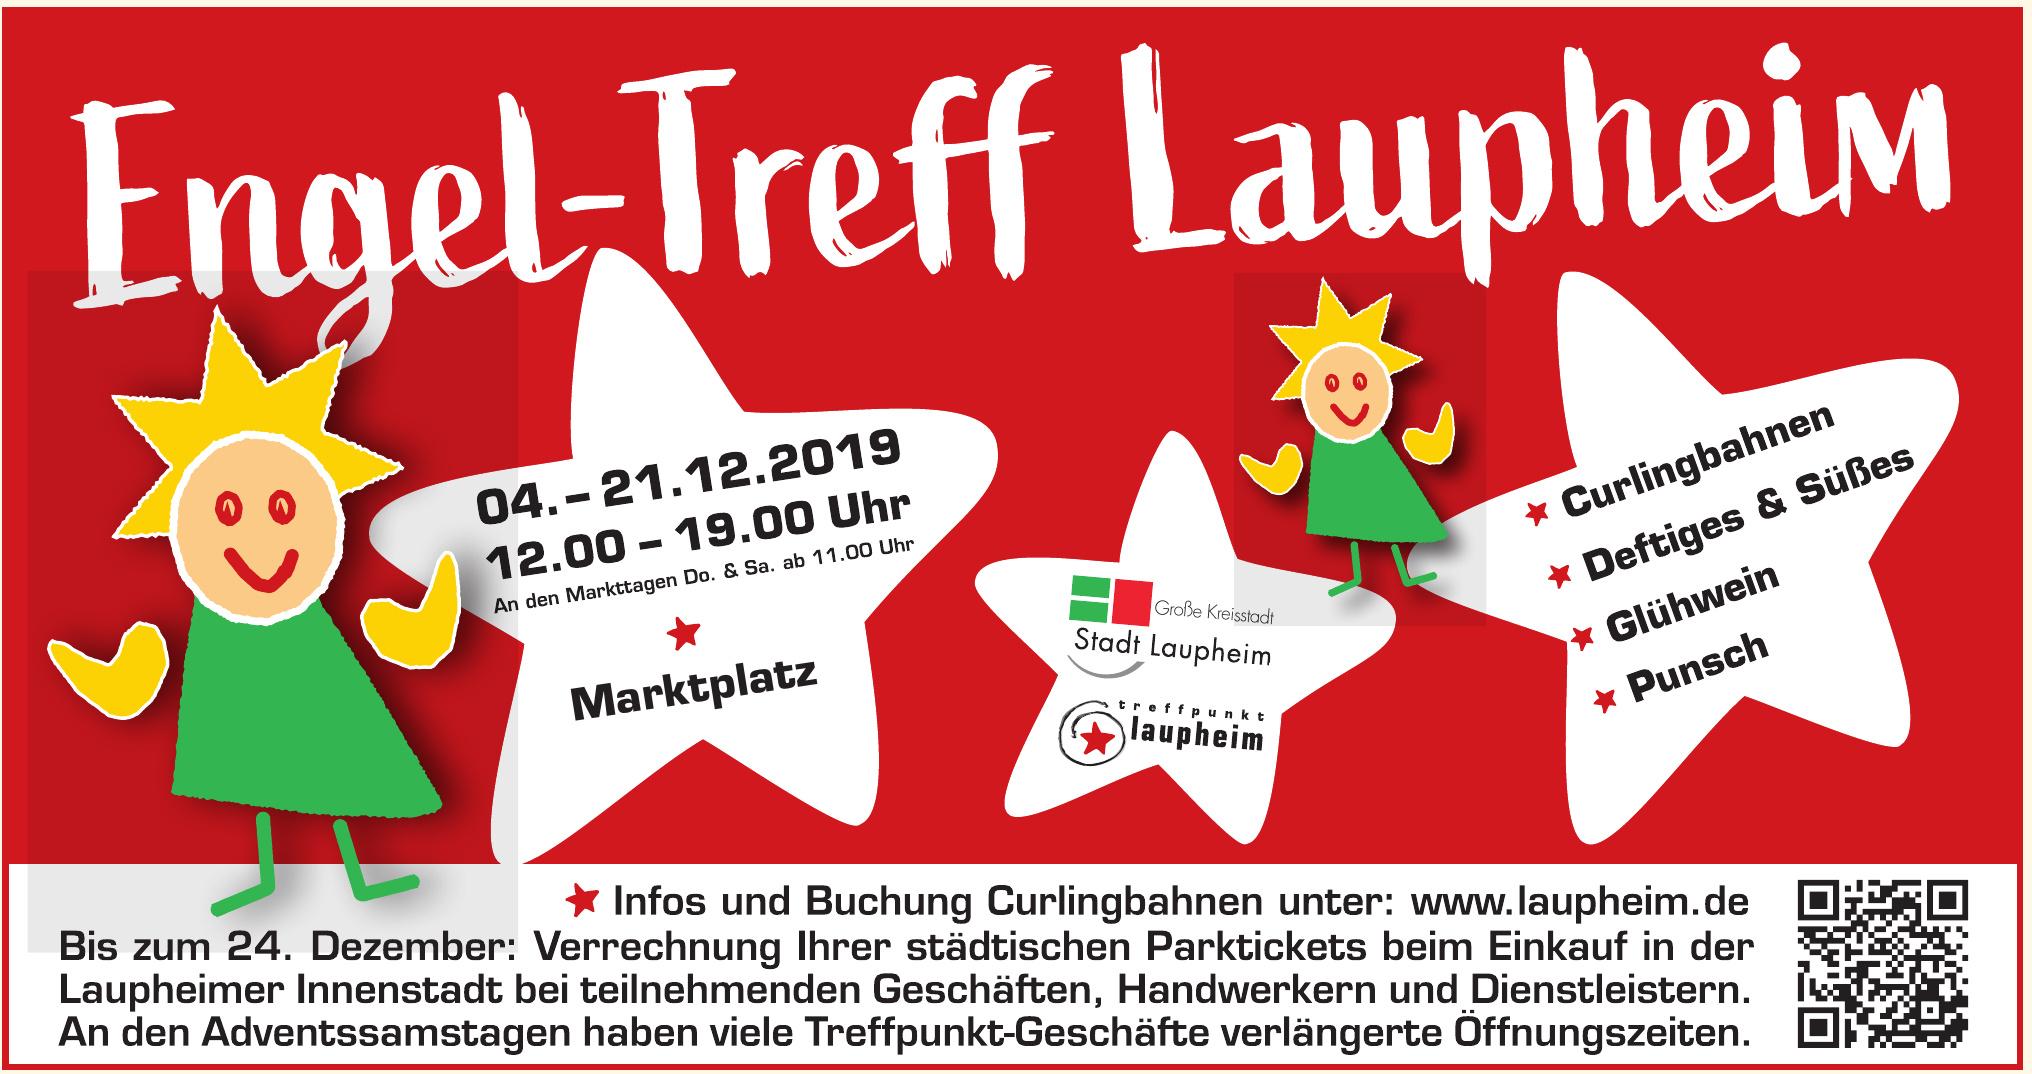 Engel-Treff Laupheim